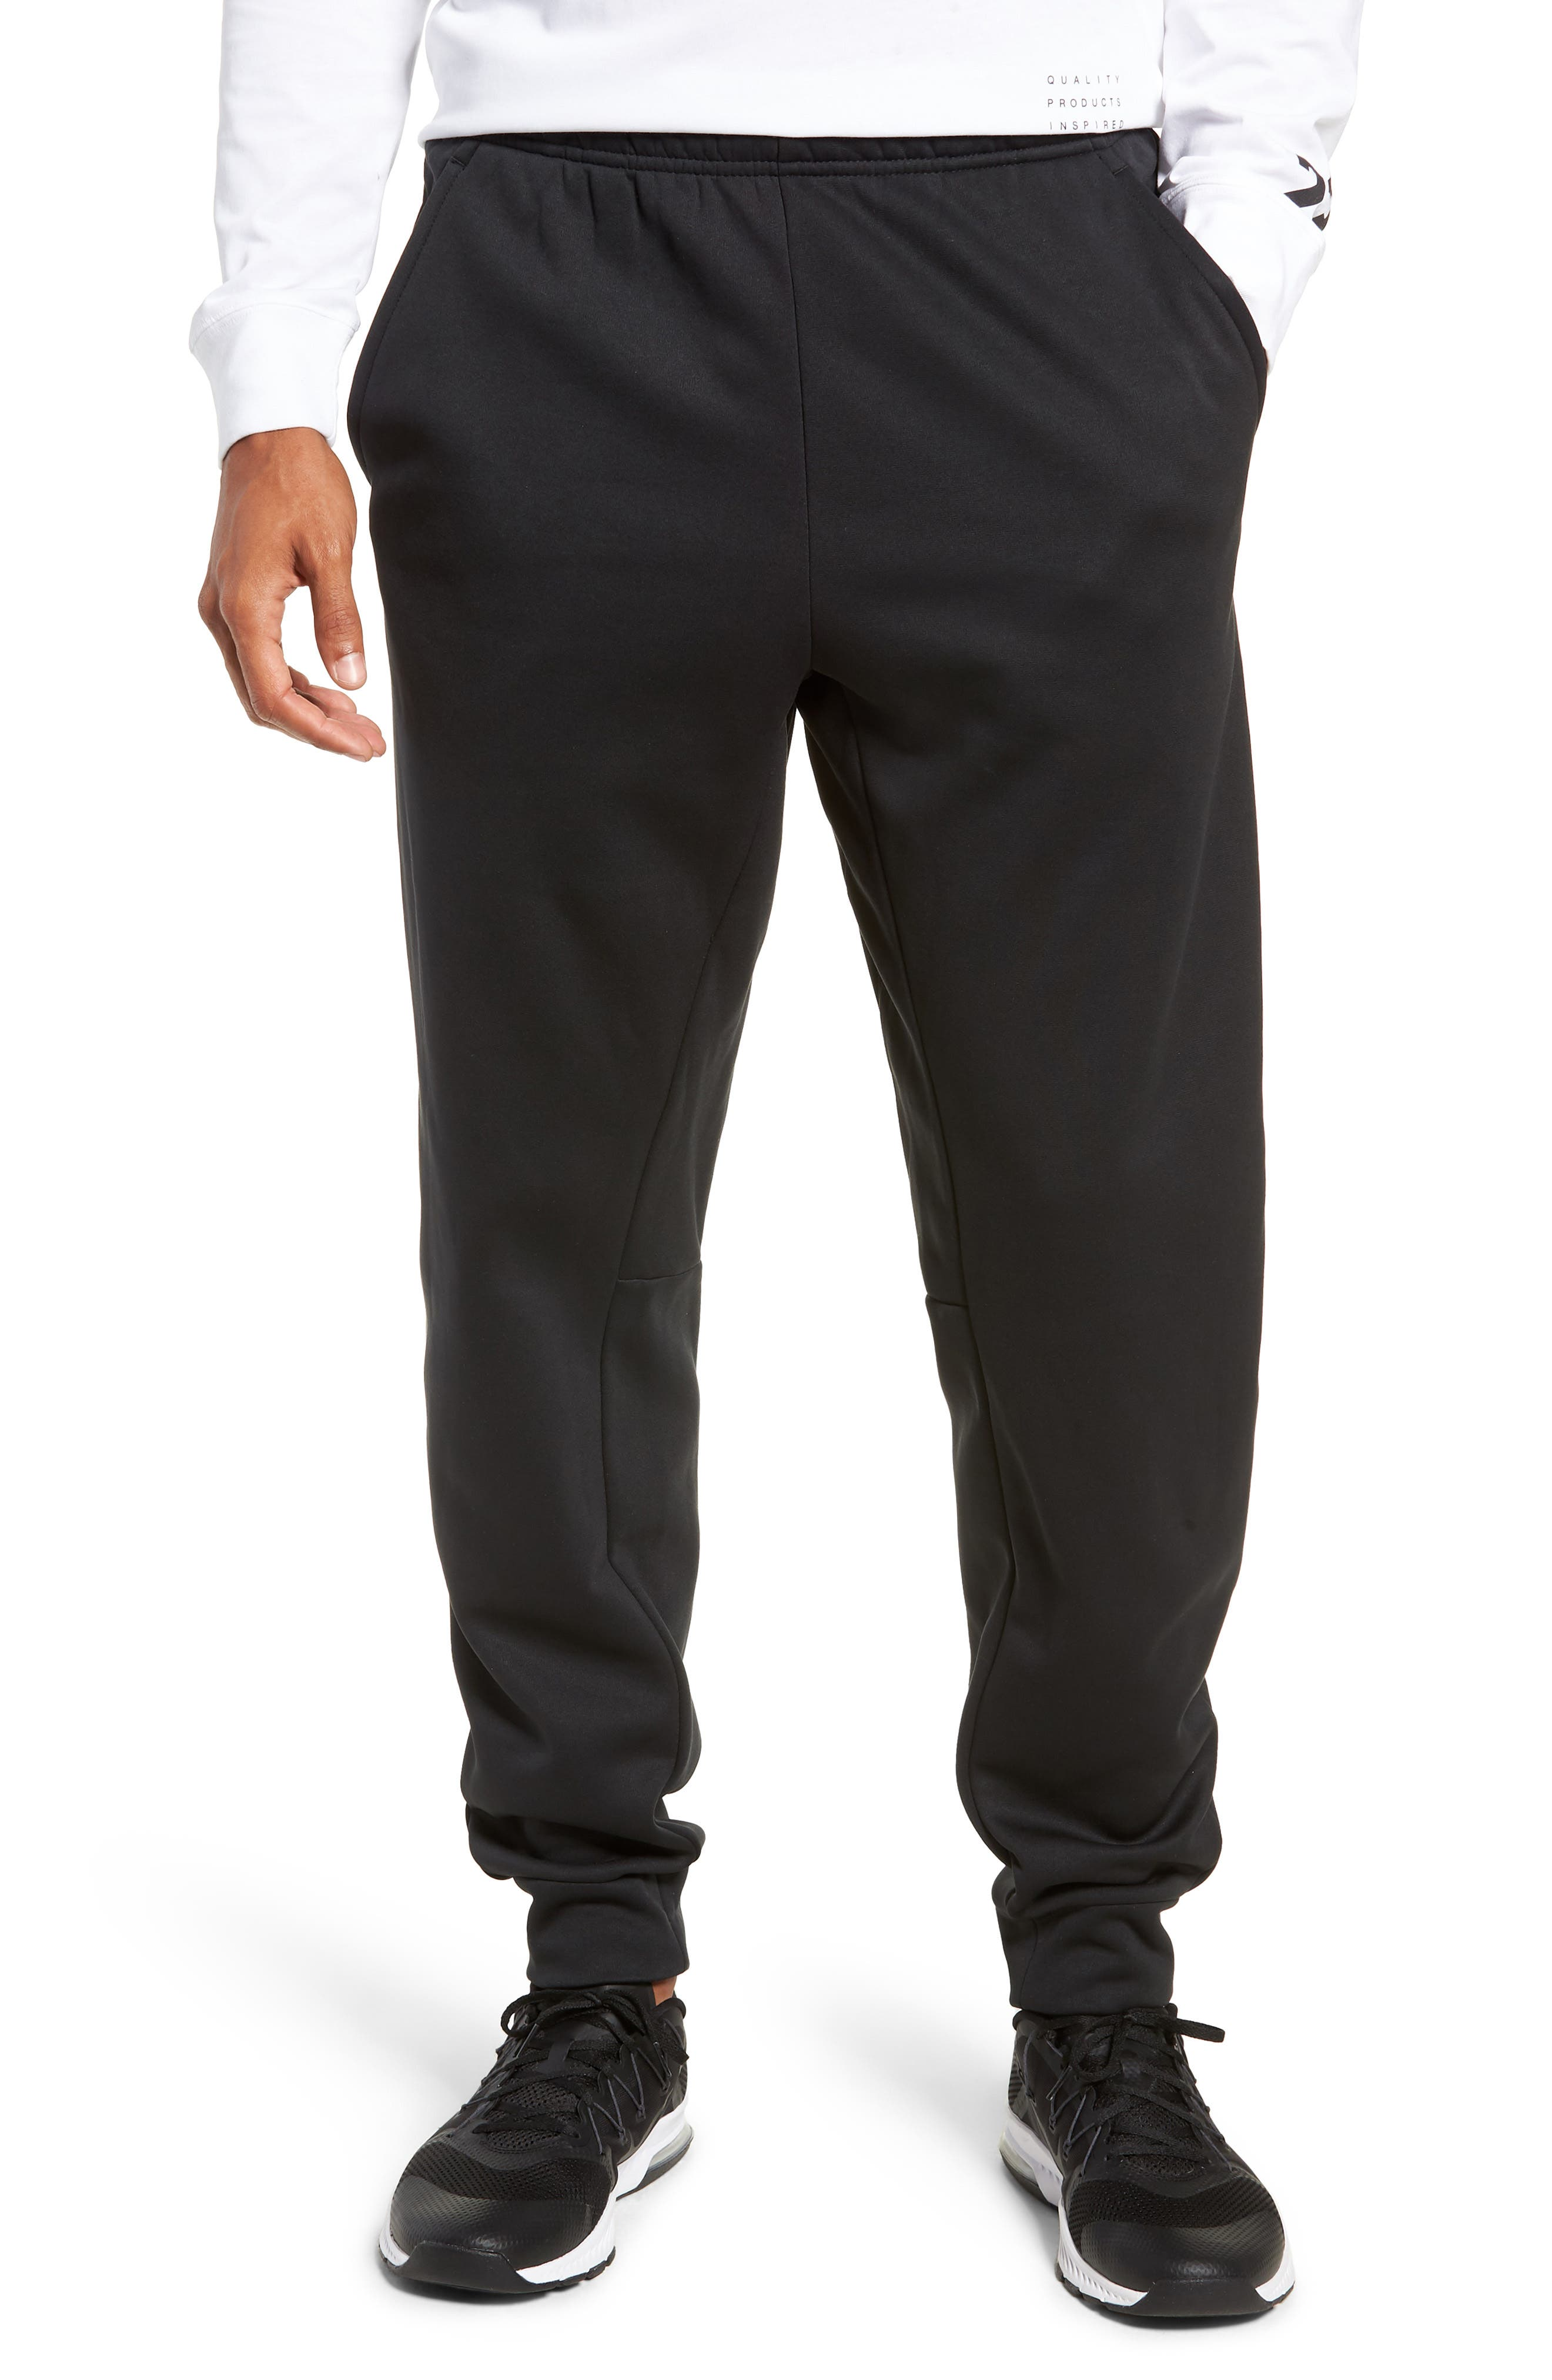 Therma Tapered Pants,                             Main thumbnail 1, color,                             BLACK/ WHITE